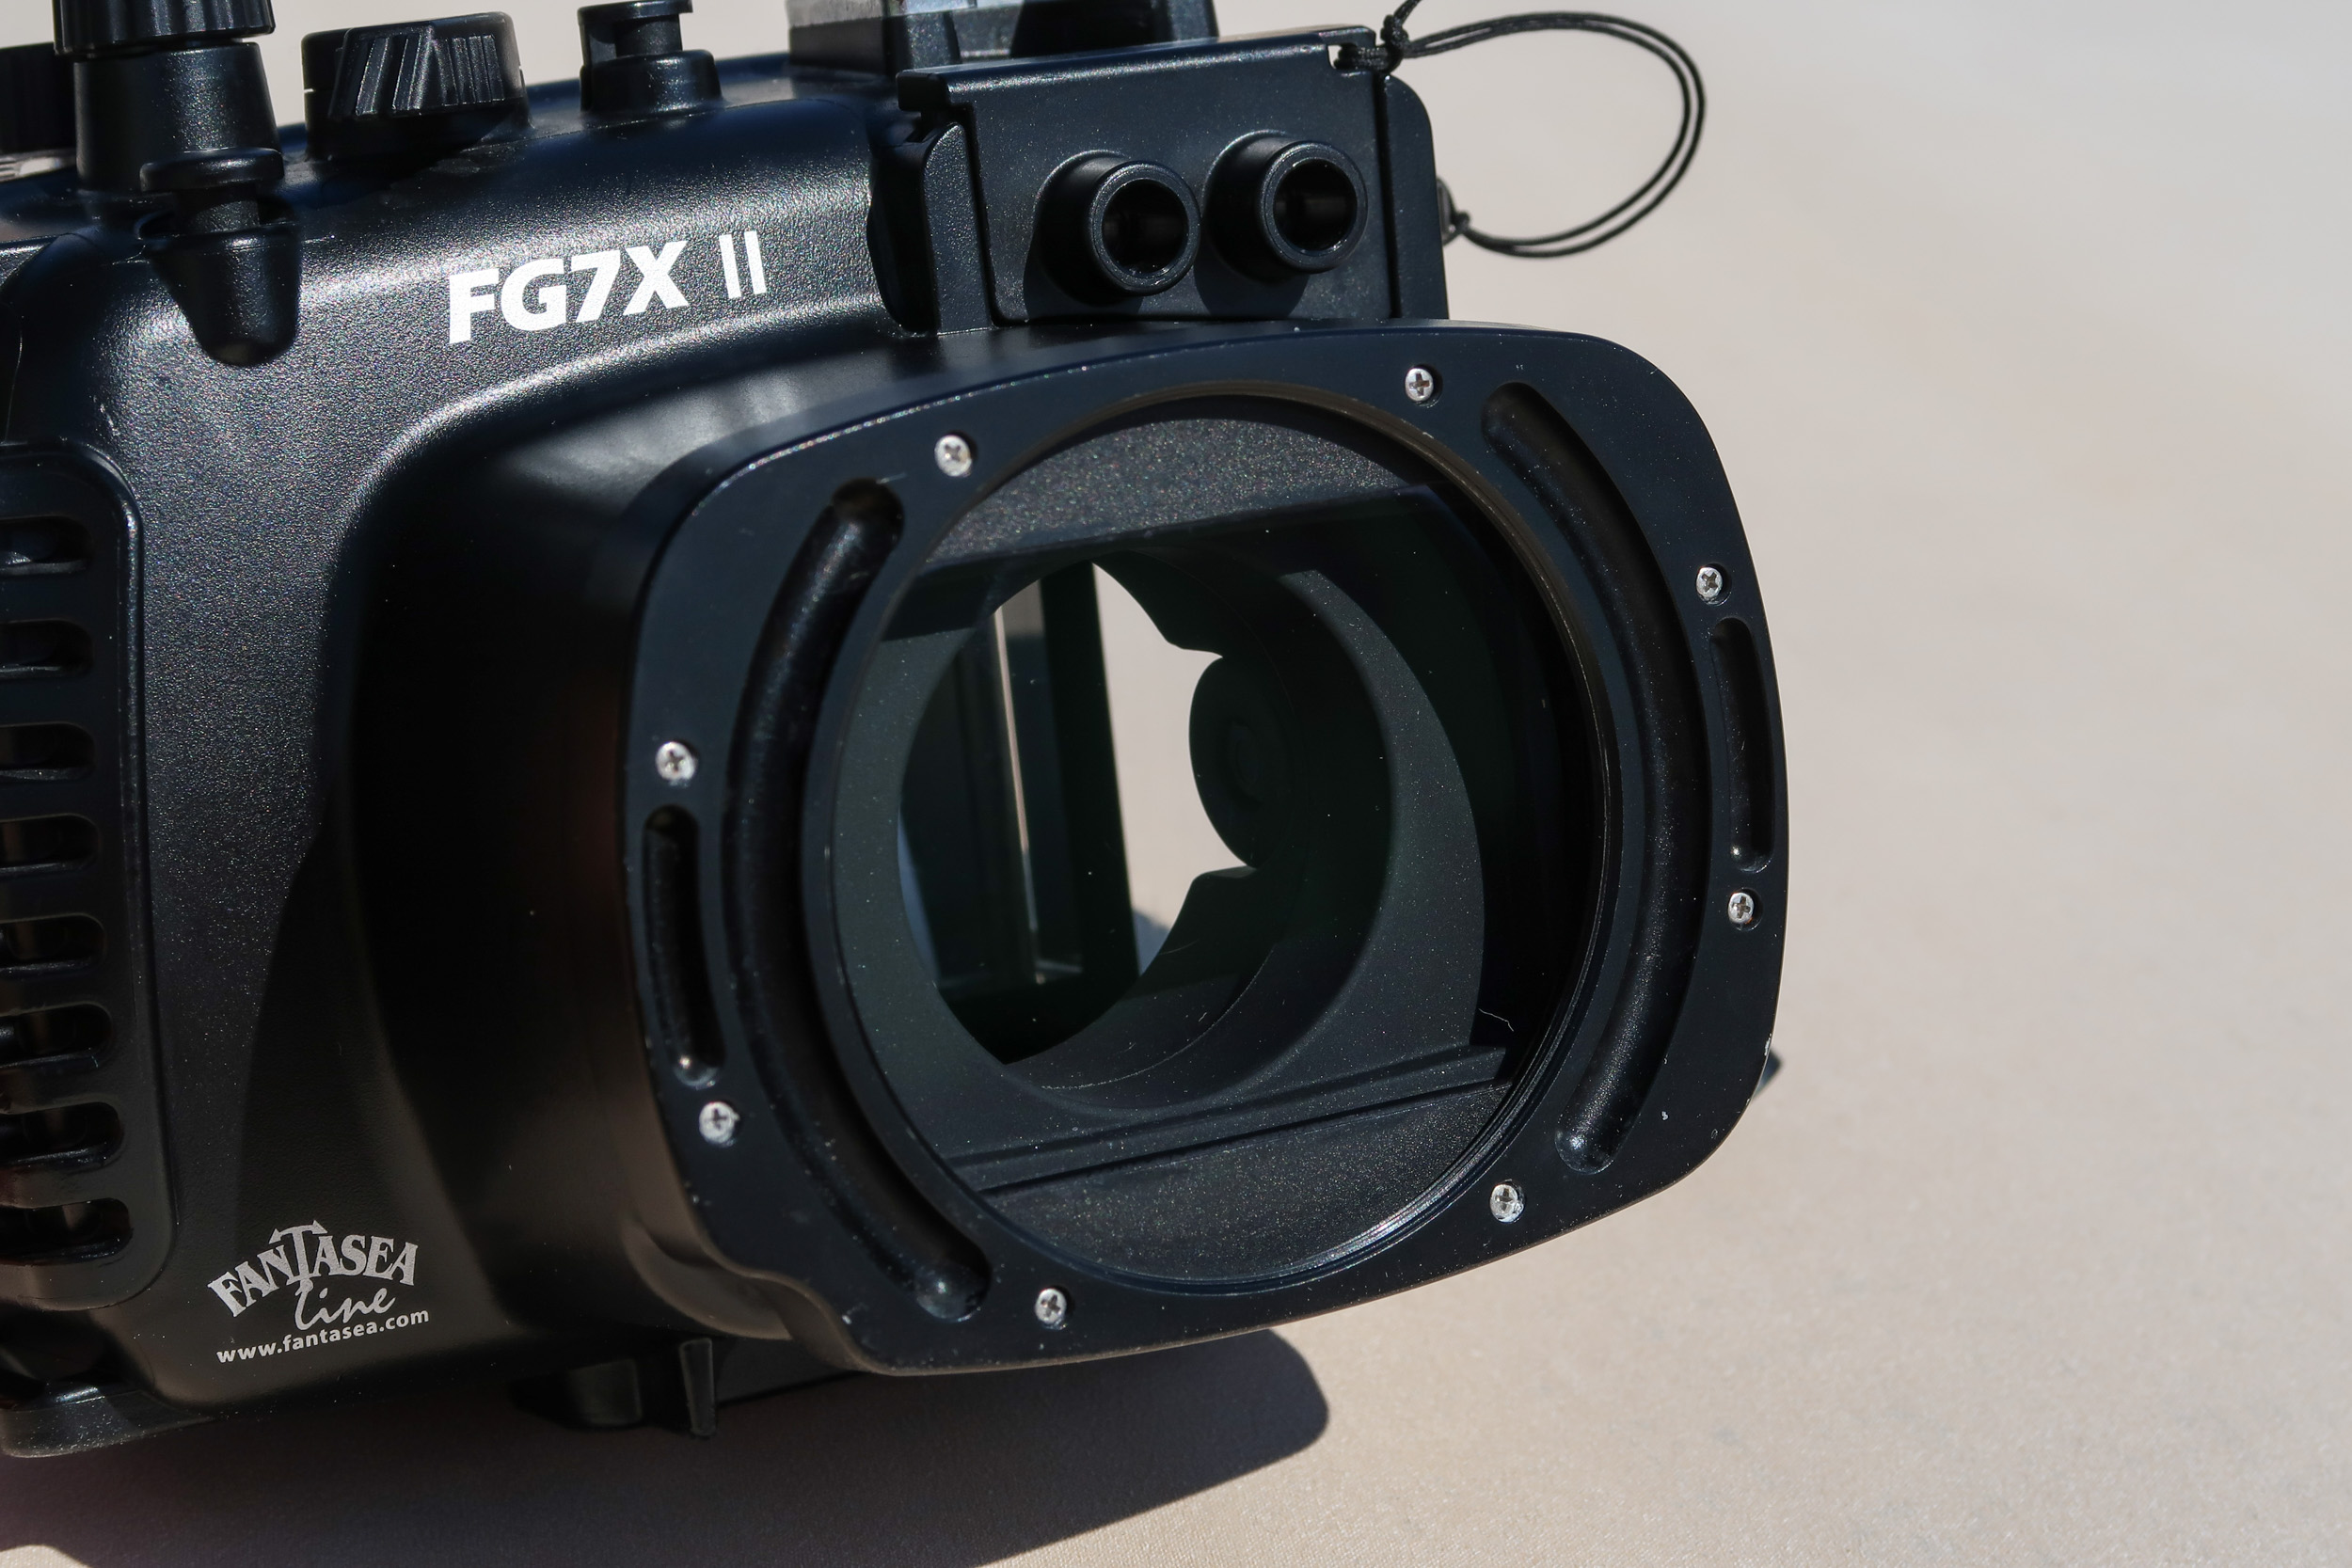 Canon G7XII and Fantasea Underwater Housing Review | Mozaik UW